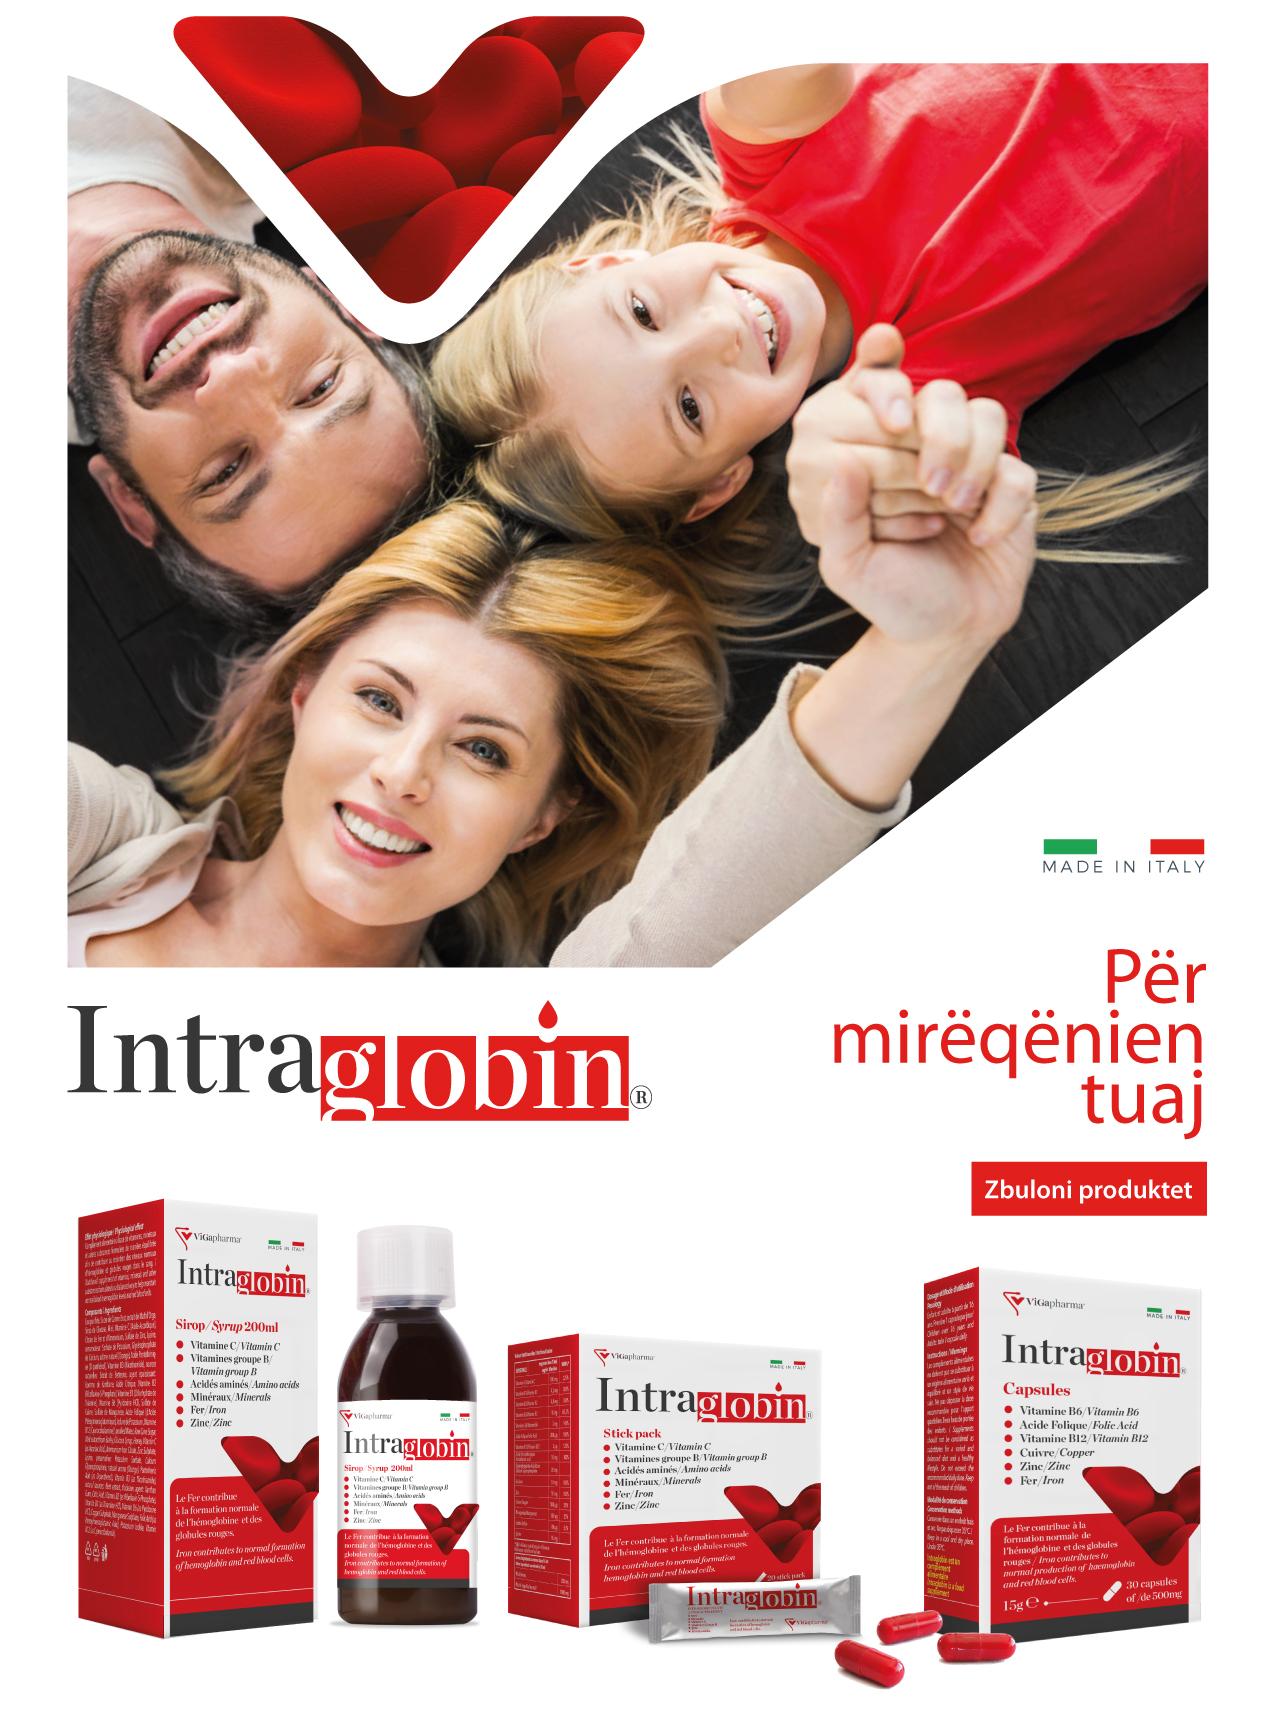 Intraglobin | Për mirëqënien tuaj